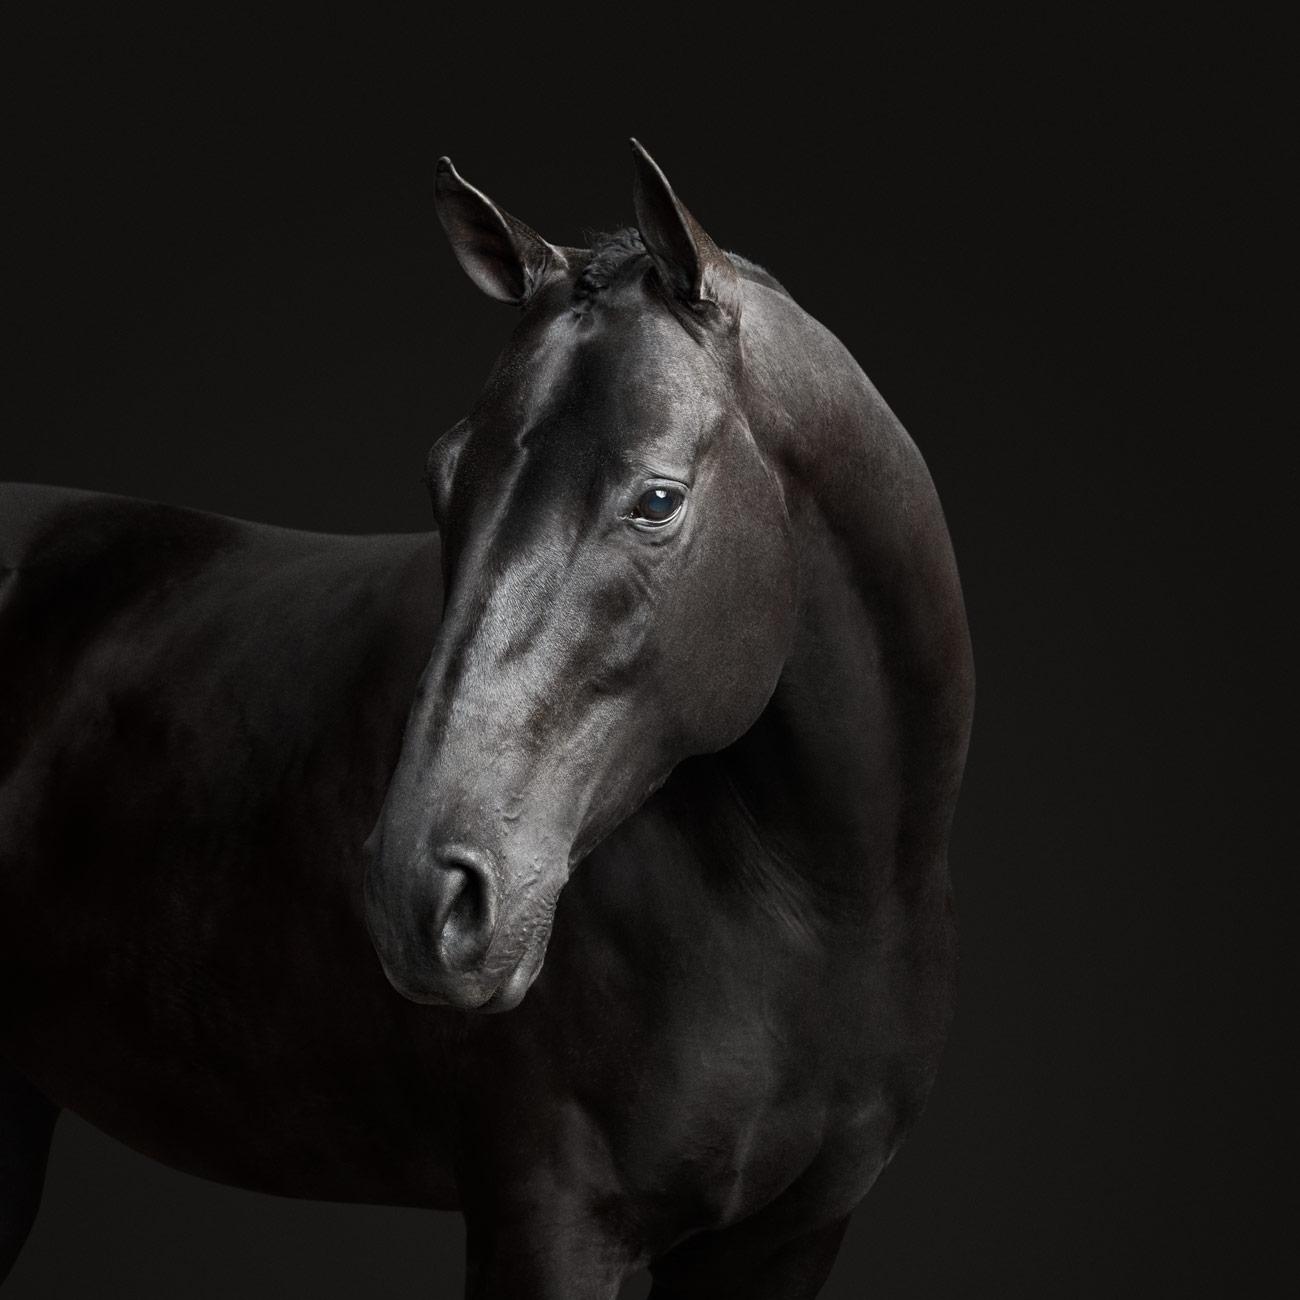 black-betty-horse-2_43X43.jpg